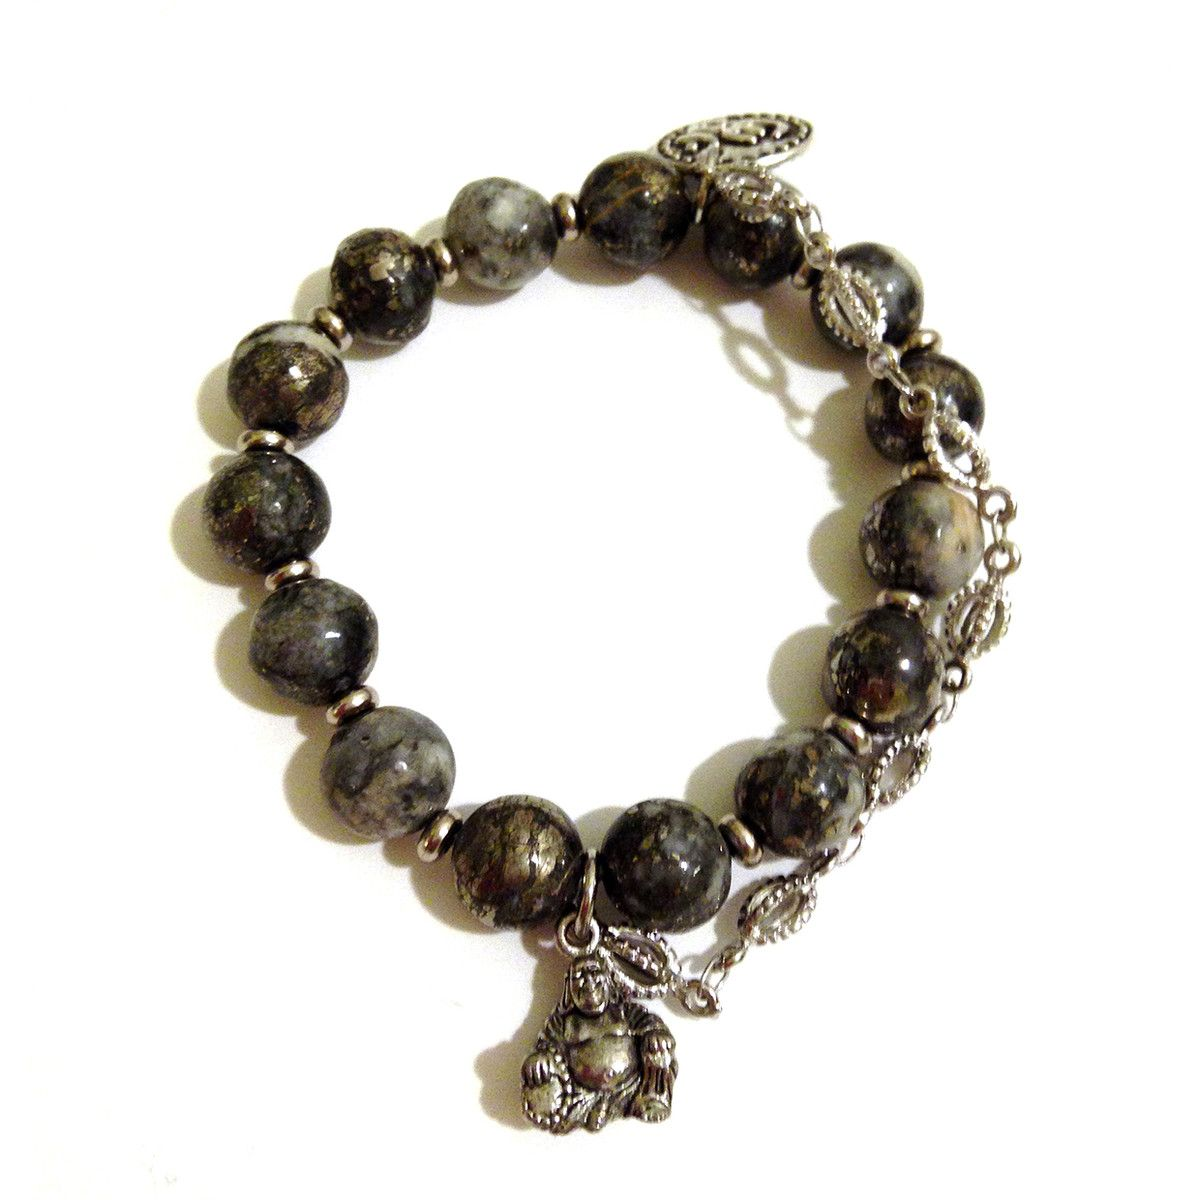 Pyrite Buddha Bracelet by Guilty jean.